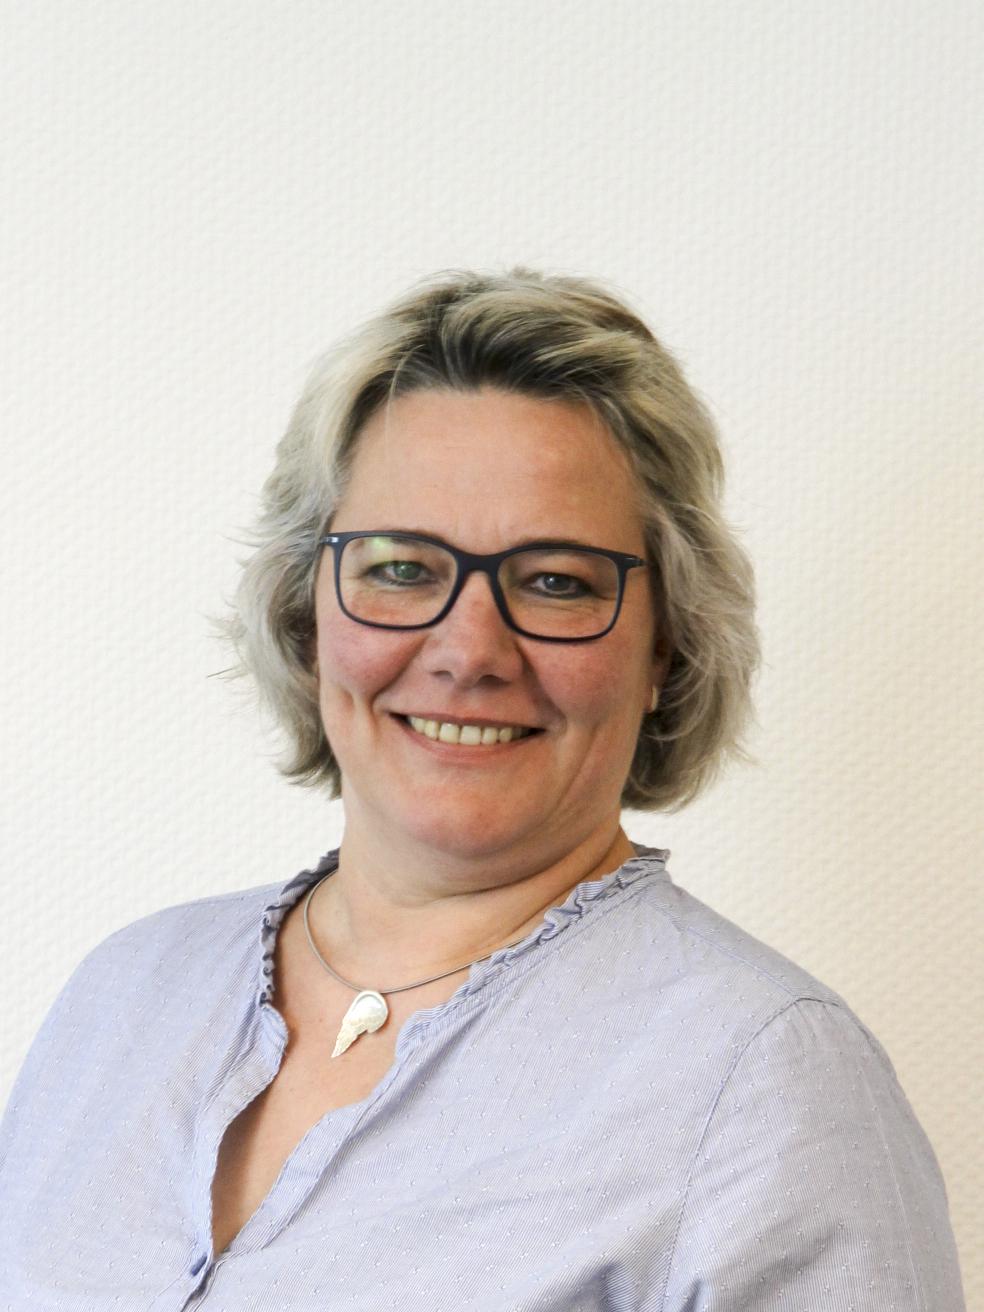 Carola Huppertz-Kunigkeit